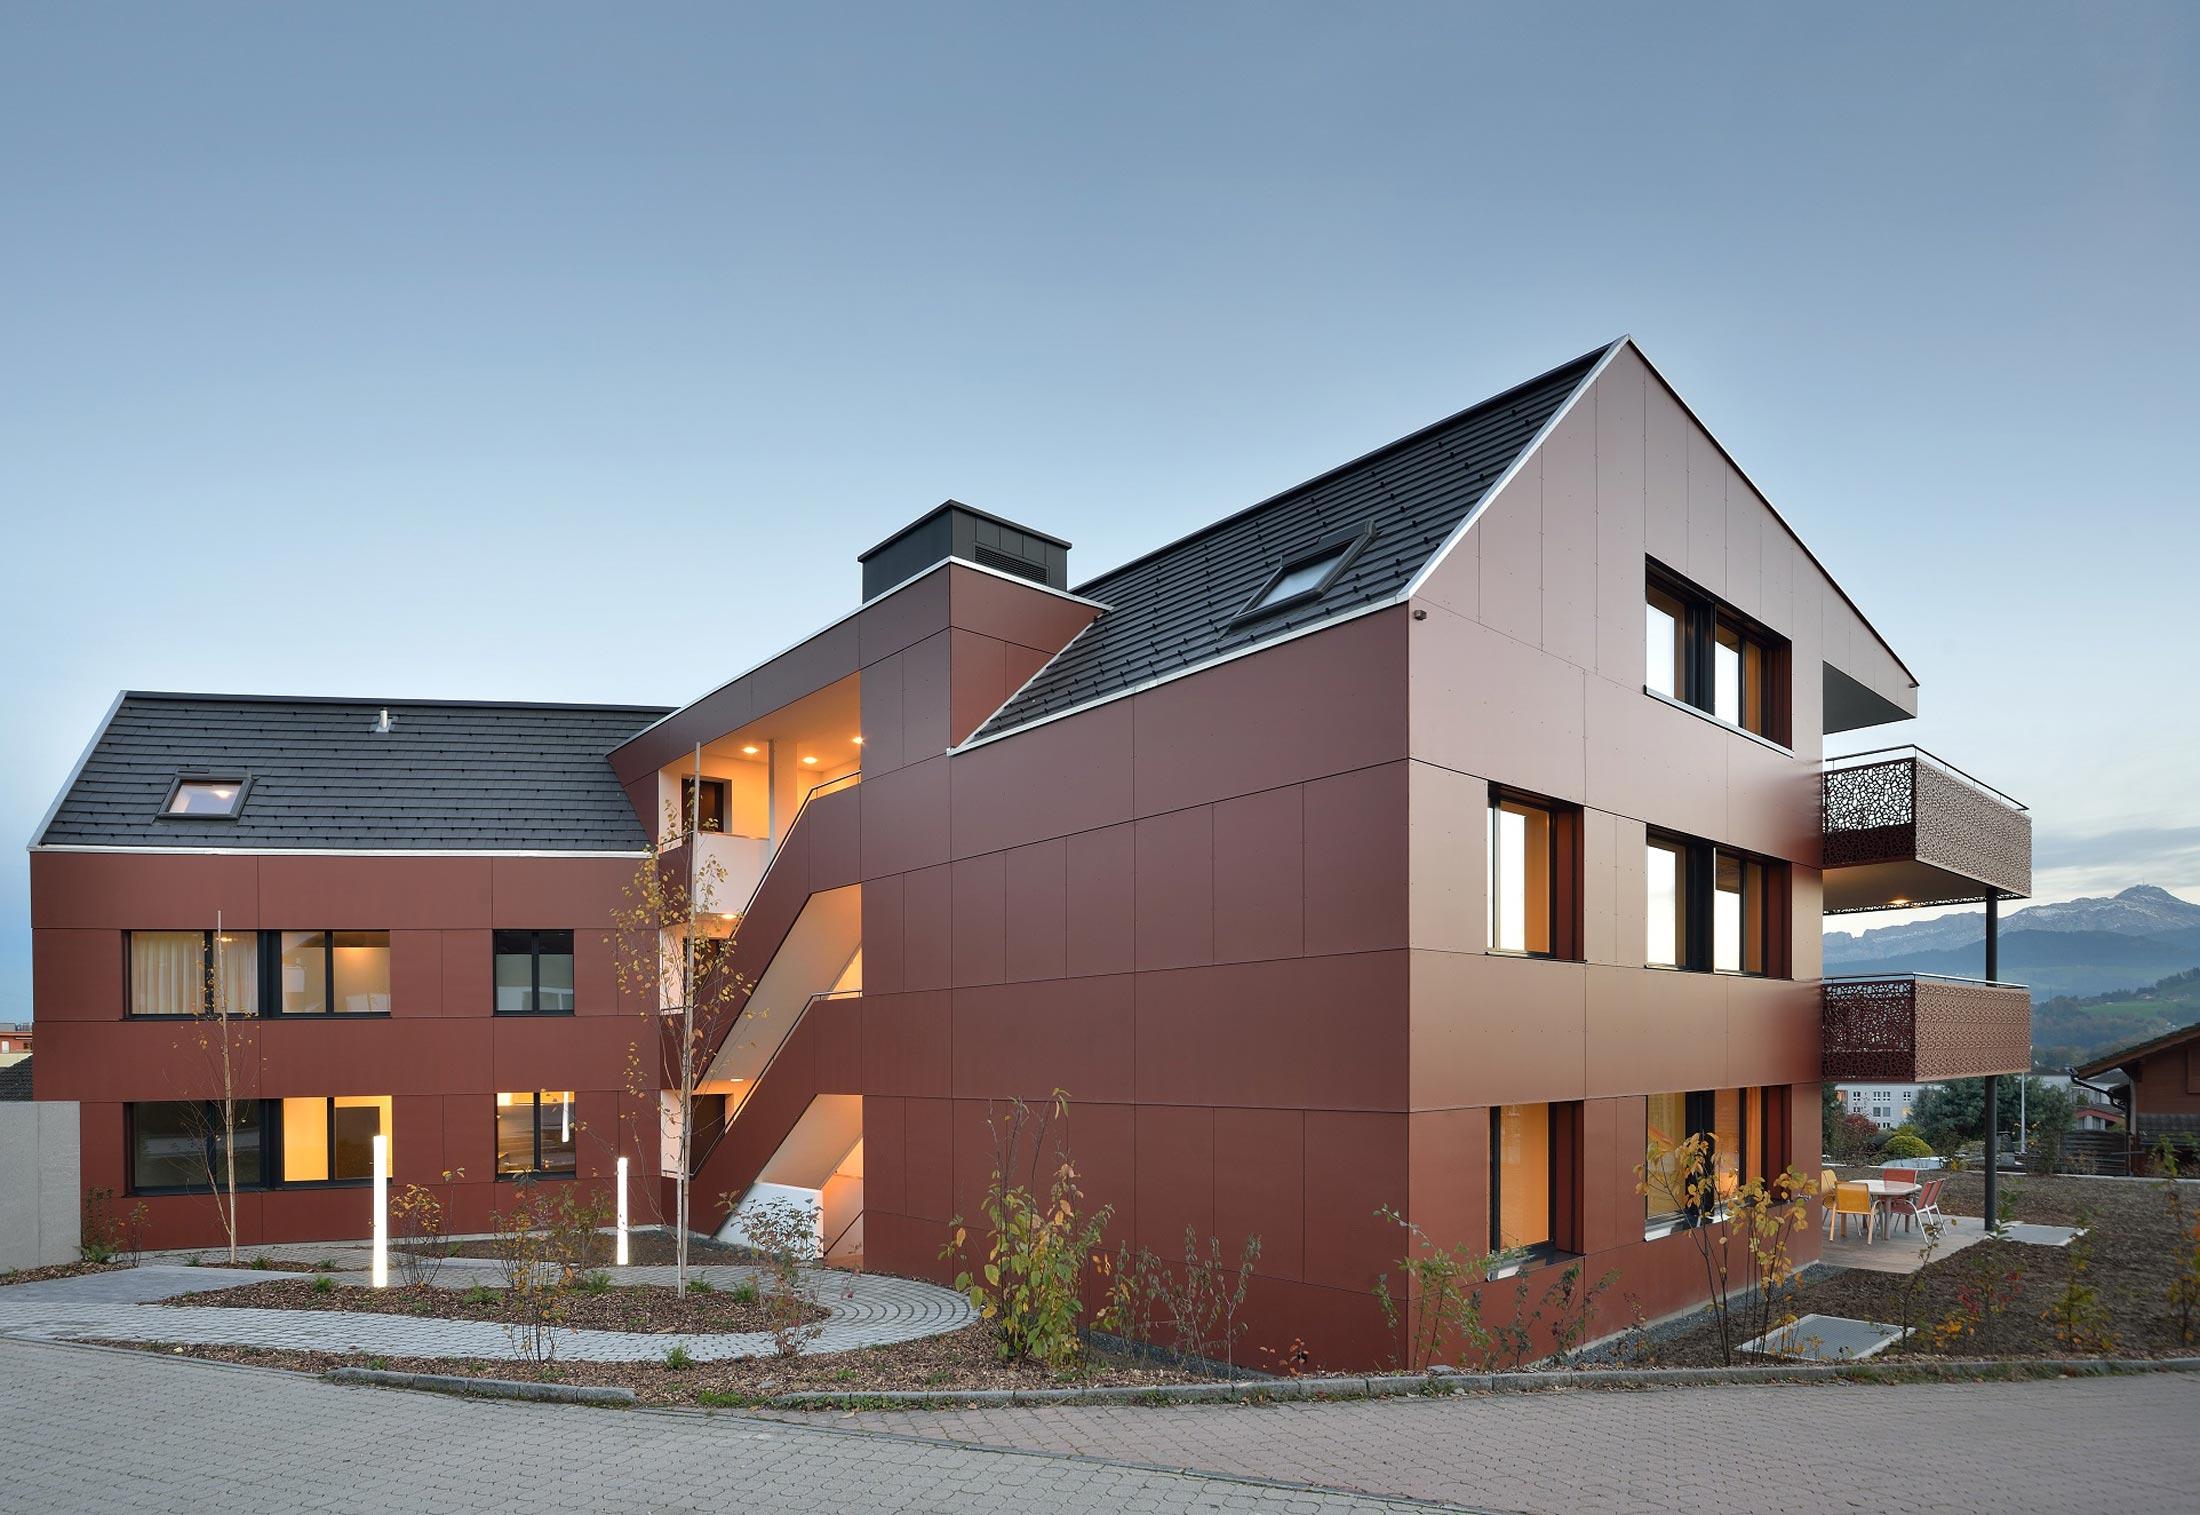 Formboard balkonbr stung von bruag stylepark for Pool design abtwil